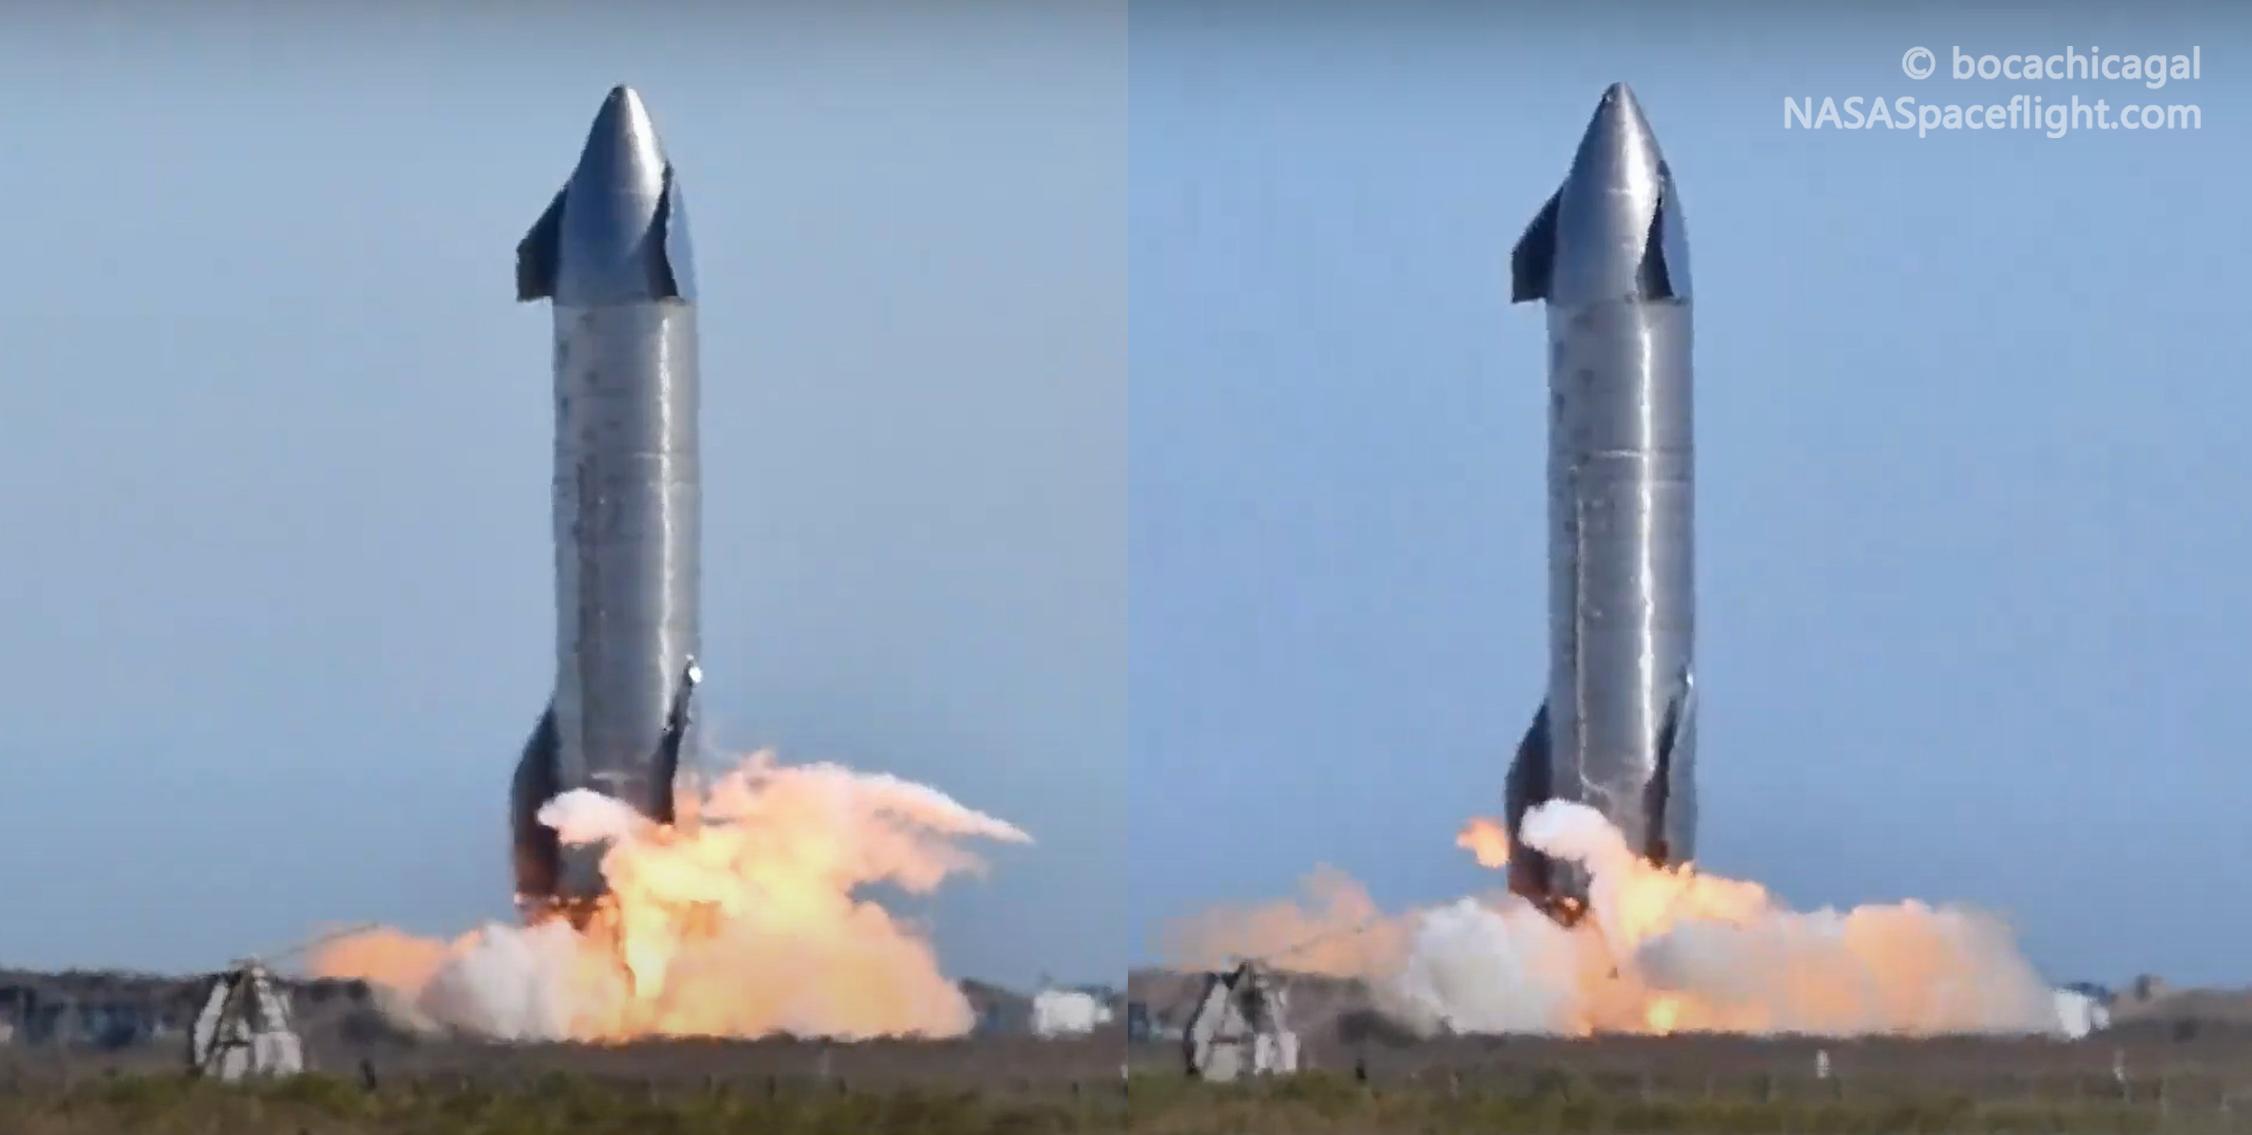 Starship Boca Chica 011321 (NASASpaceflight – bocachicagal) SN9 static fire attempt #2 #3 1